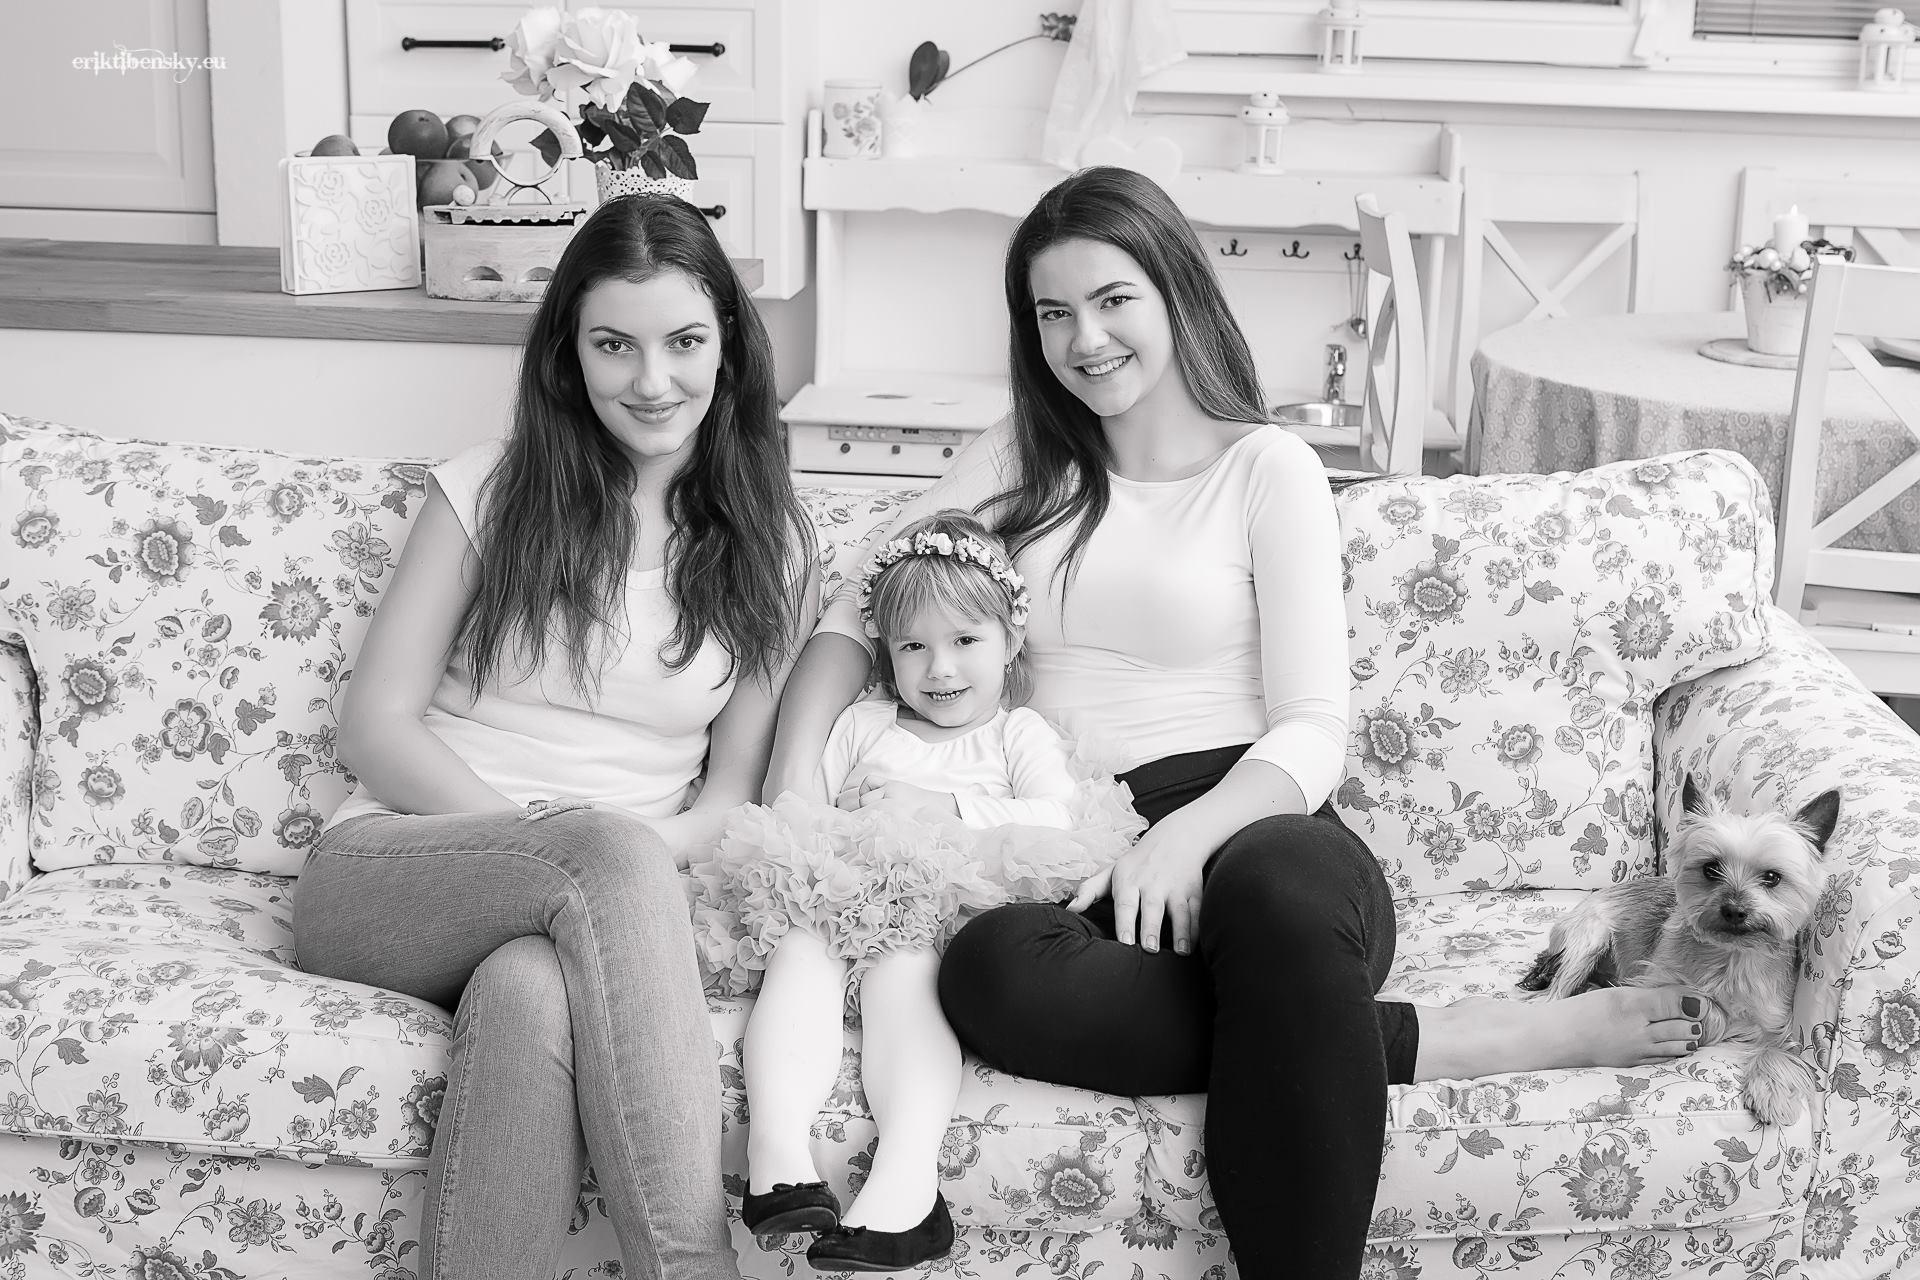 eriktibensky-eu-fotograf-home-photo-family-rodina-kids-deti-1009